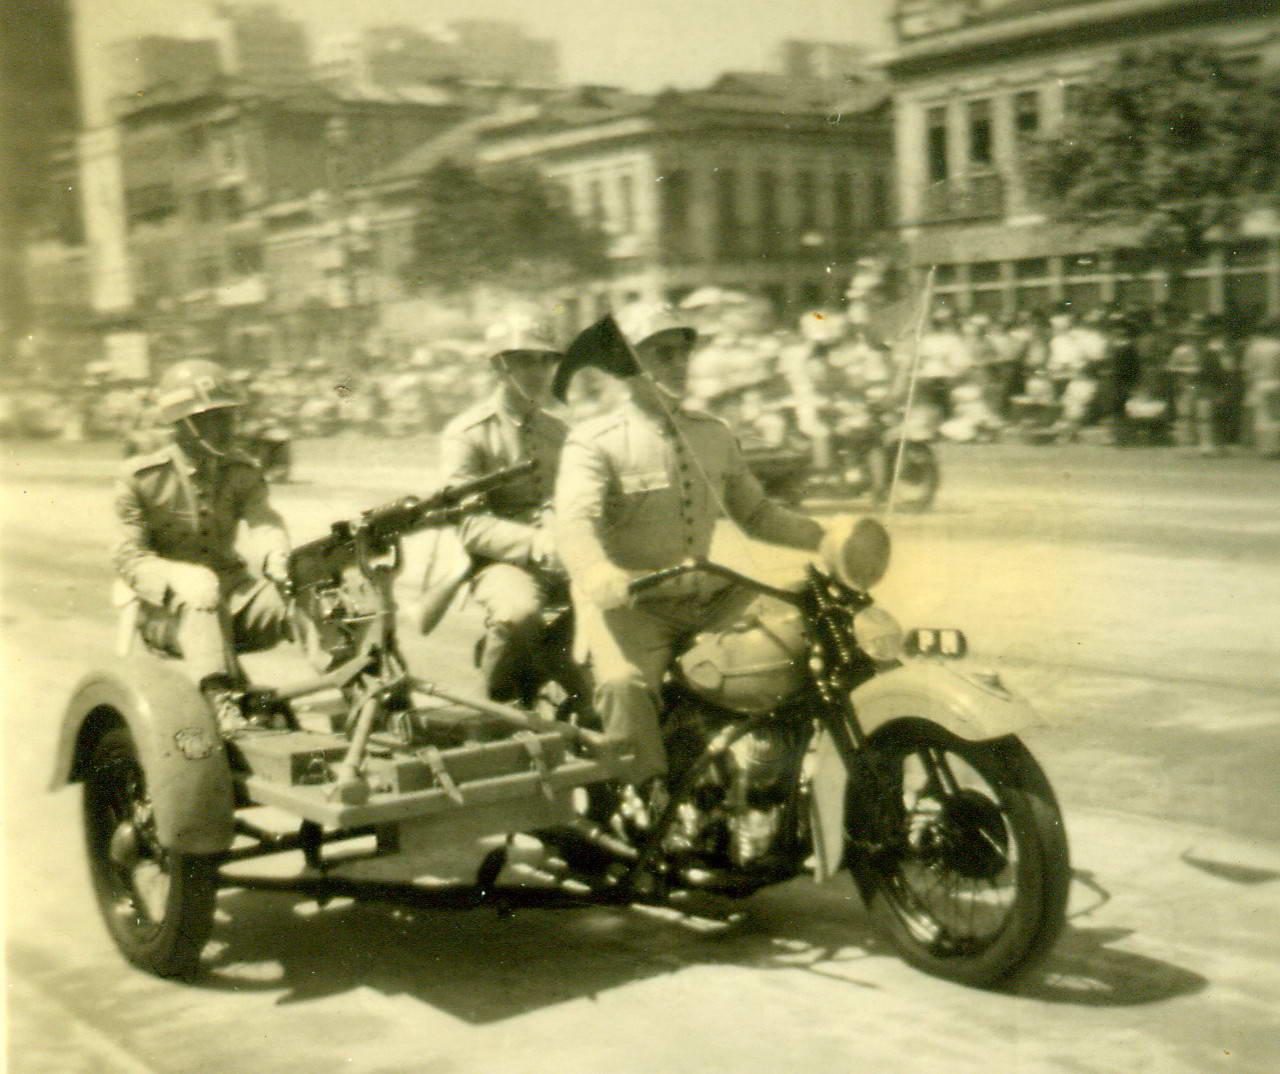 Guns And Motorcycles: A Photo Essay